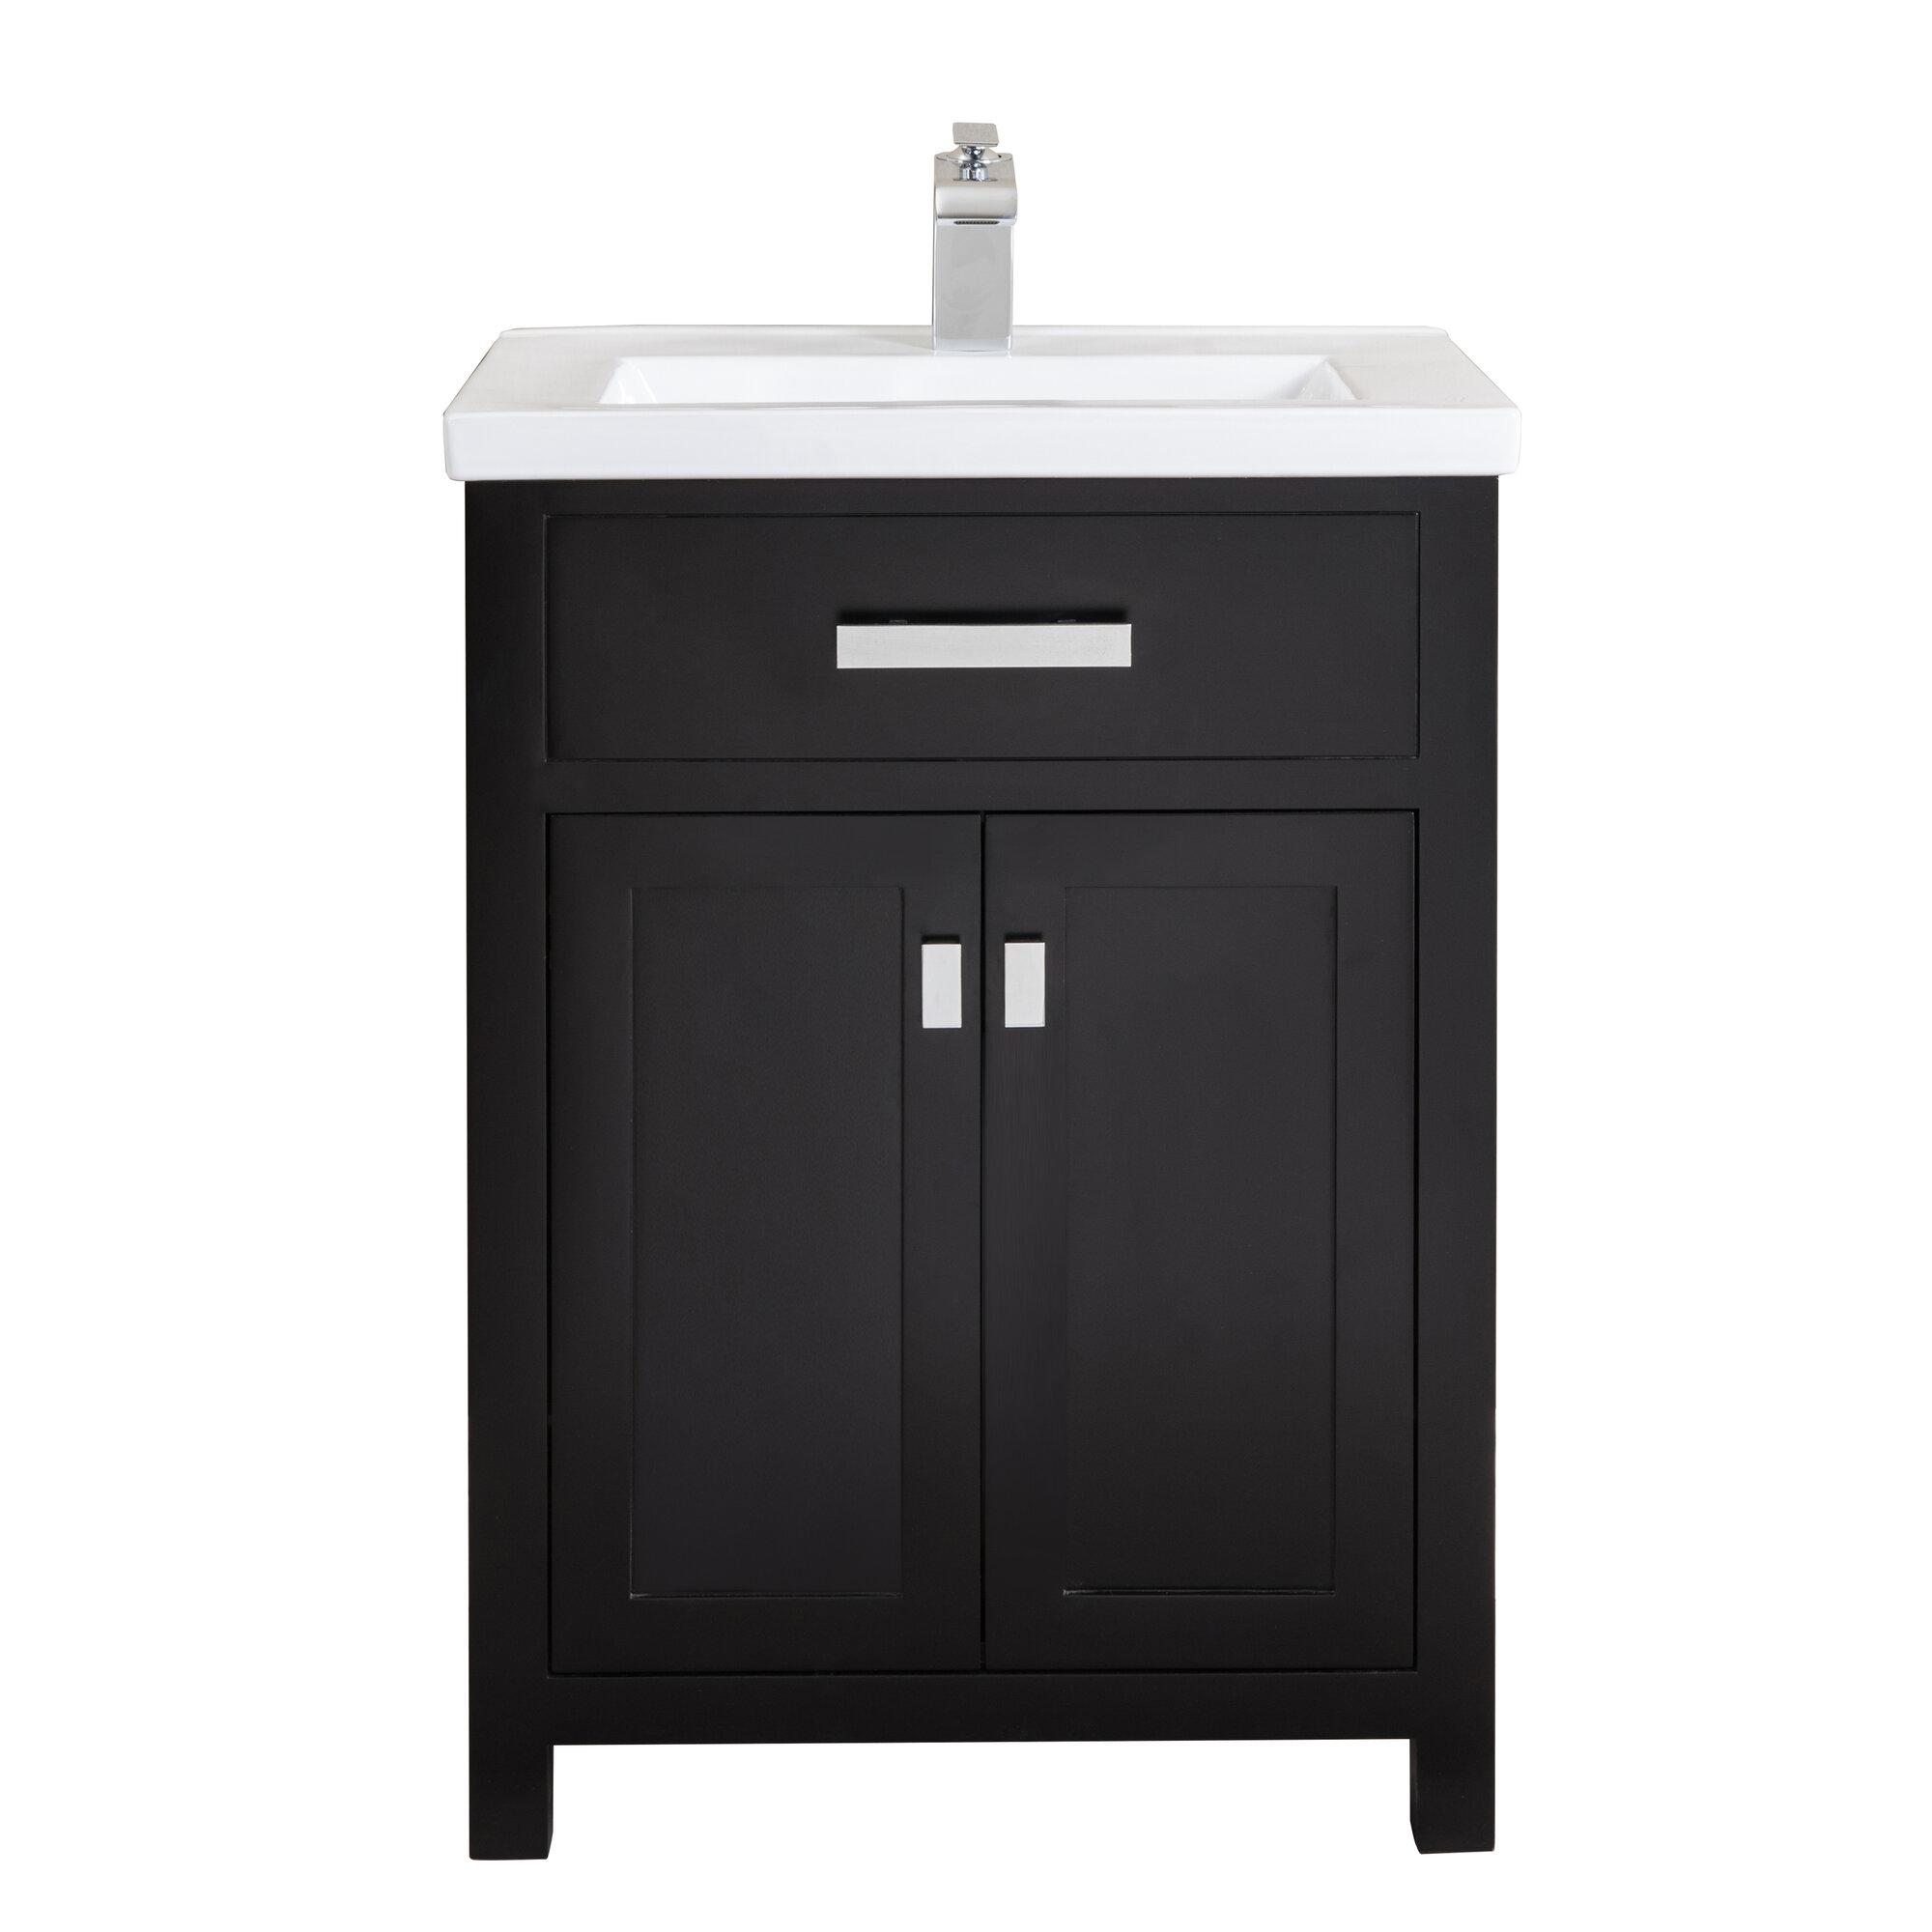 Wrought studio roque 24 single bathroom vanity set ebay wrought studio roque 24 034 single bathroom vanity geotapseo Image collections